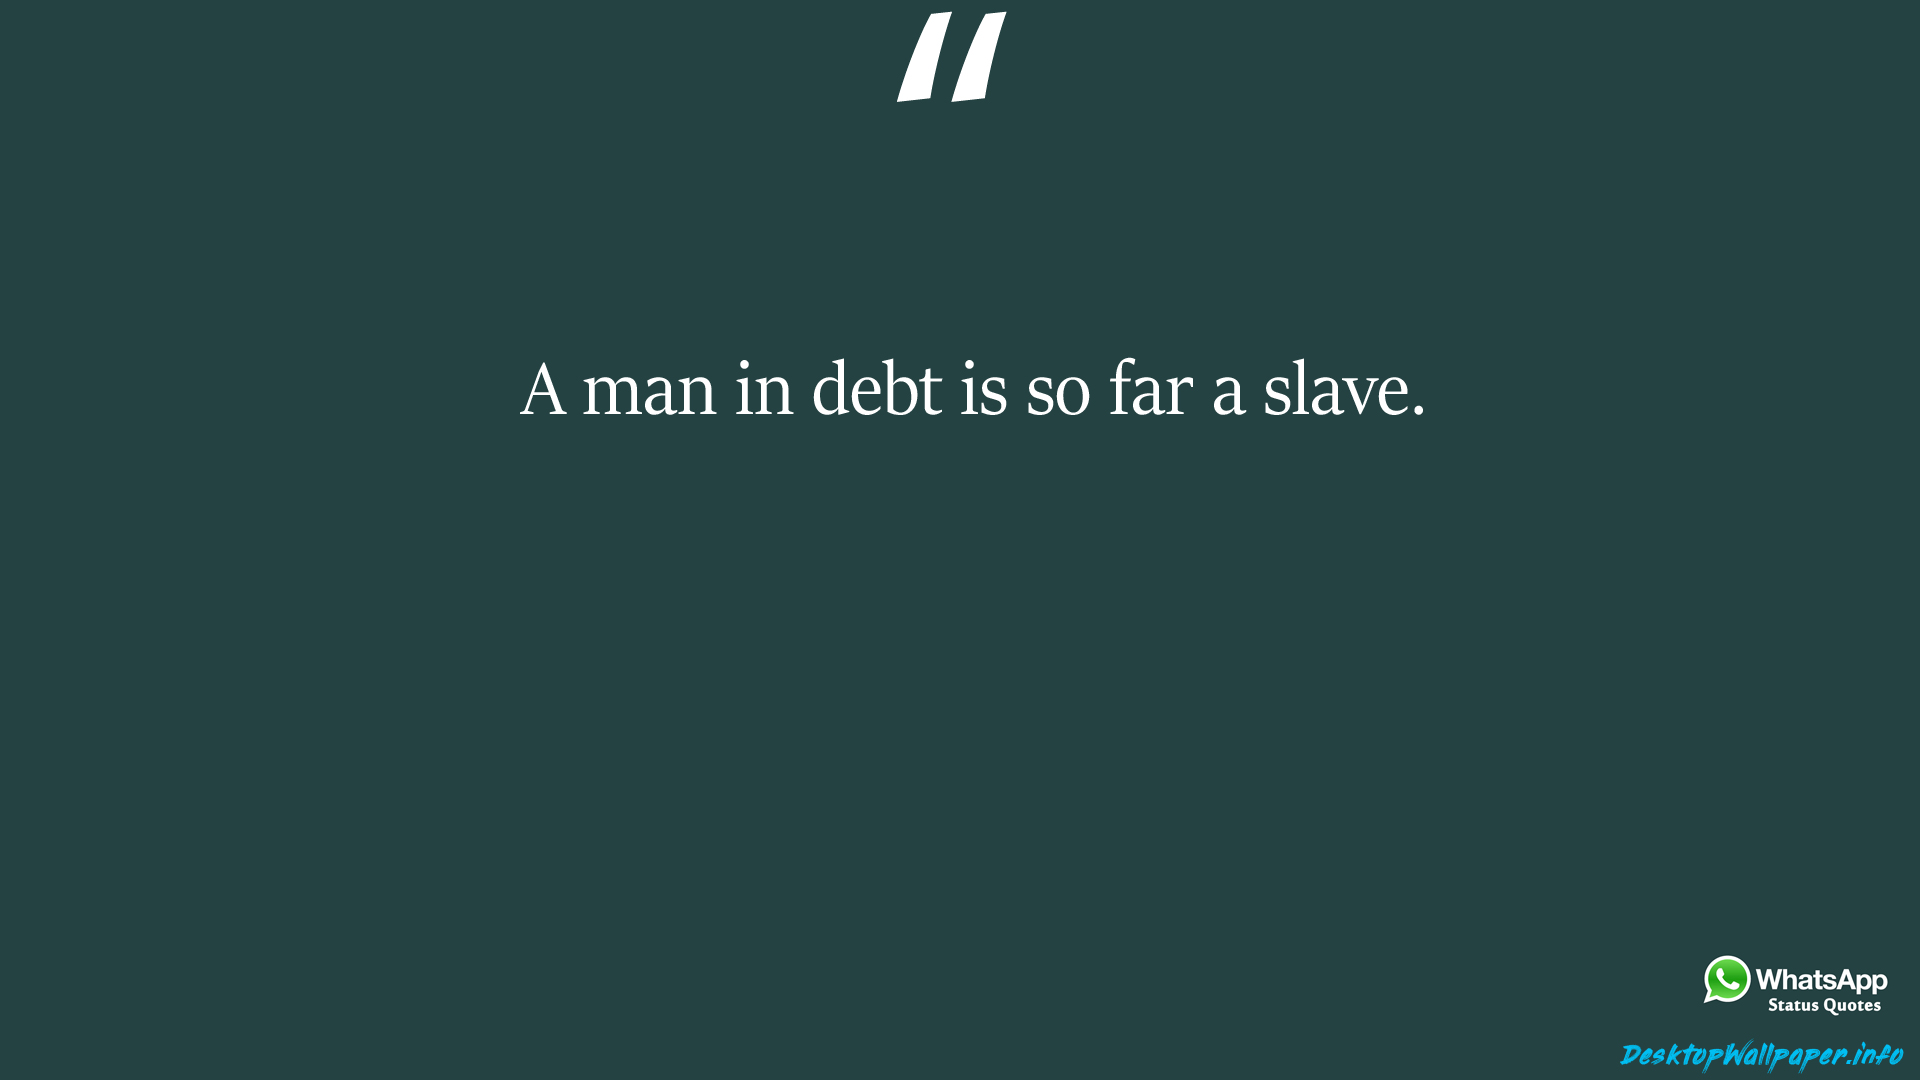 A man in debt is so far a slave